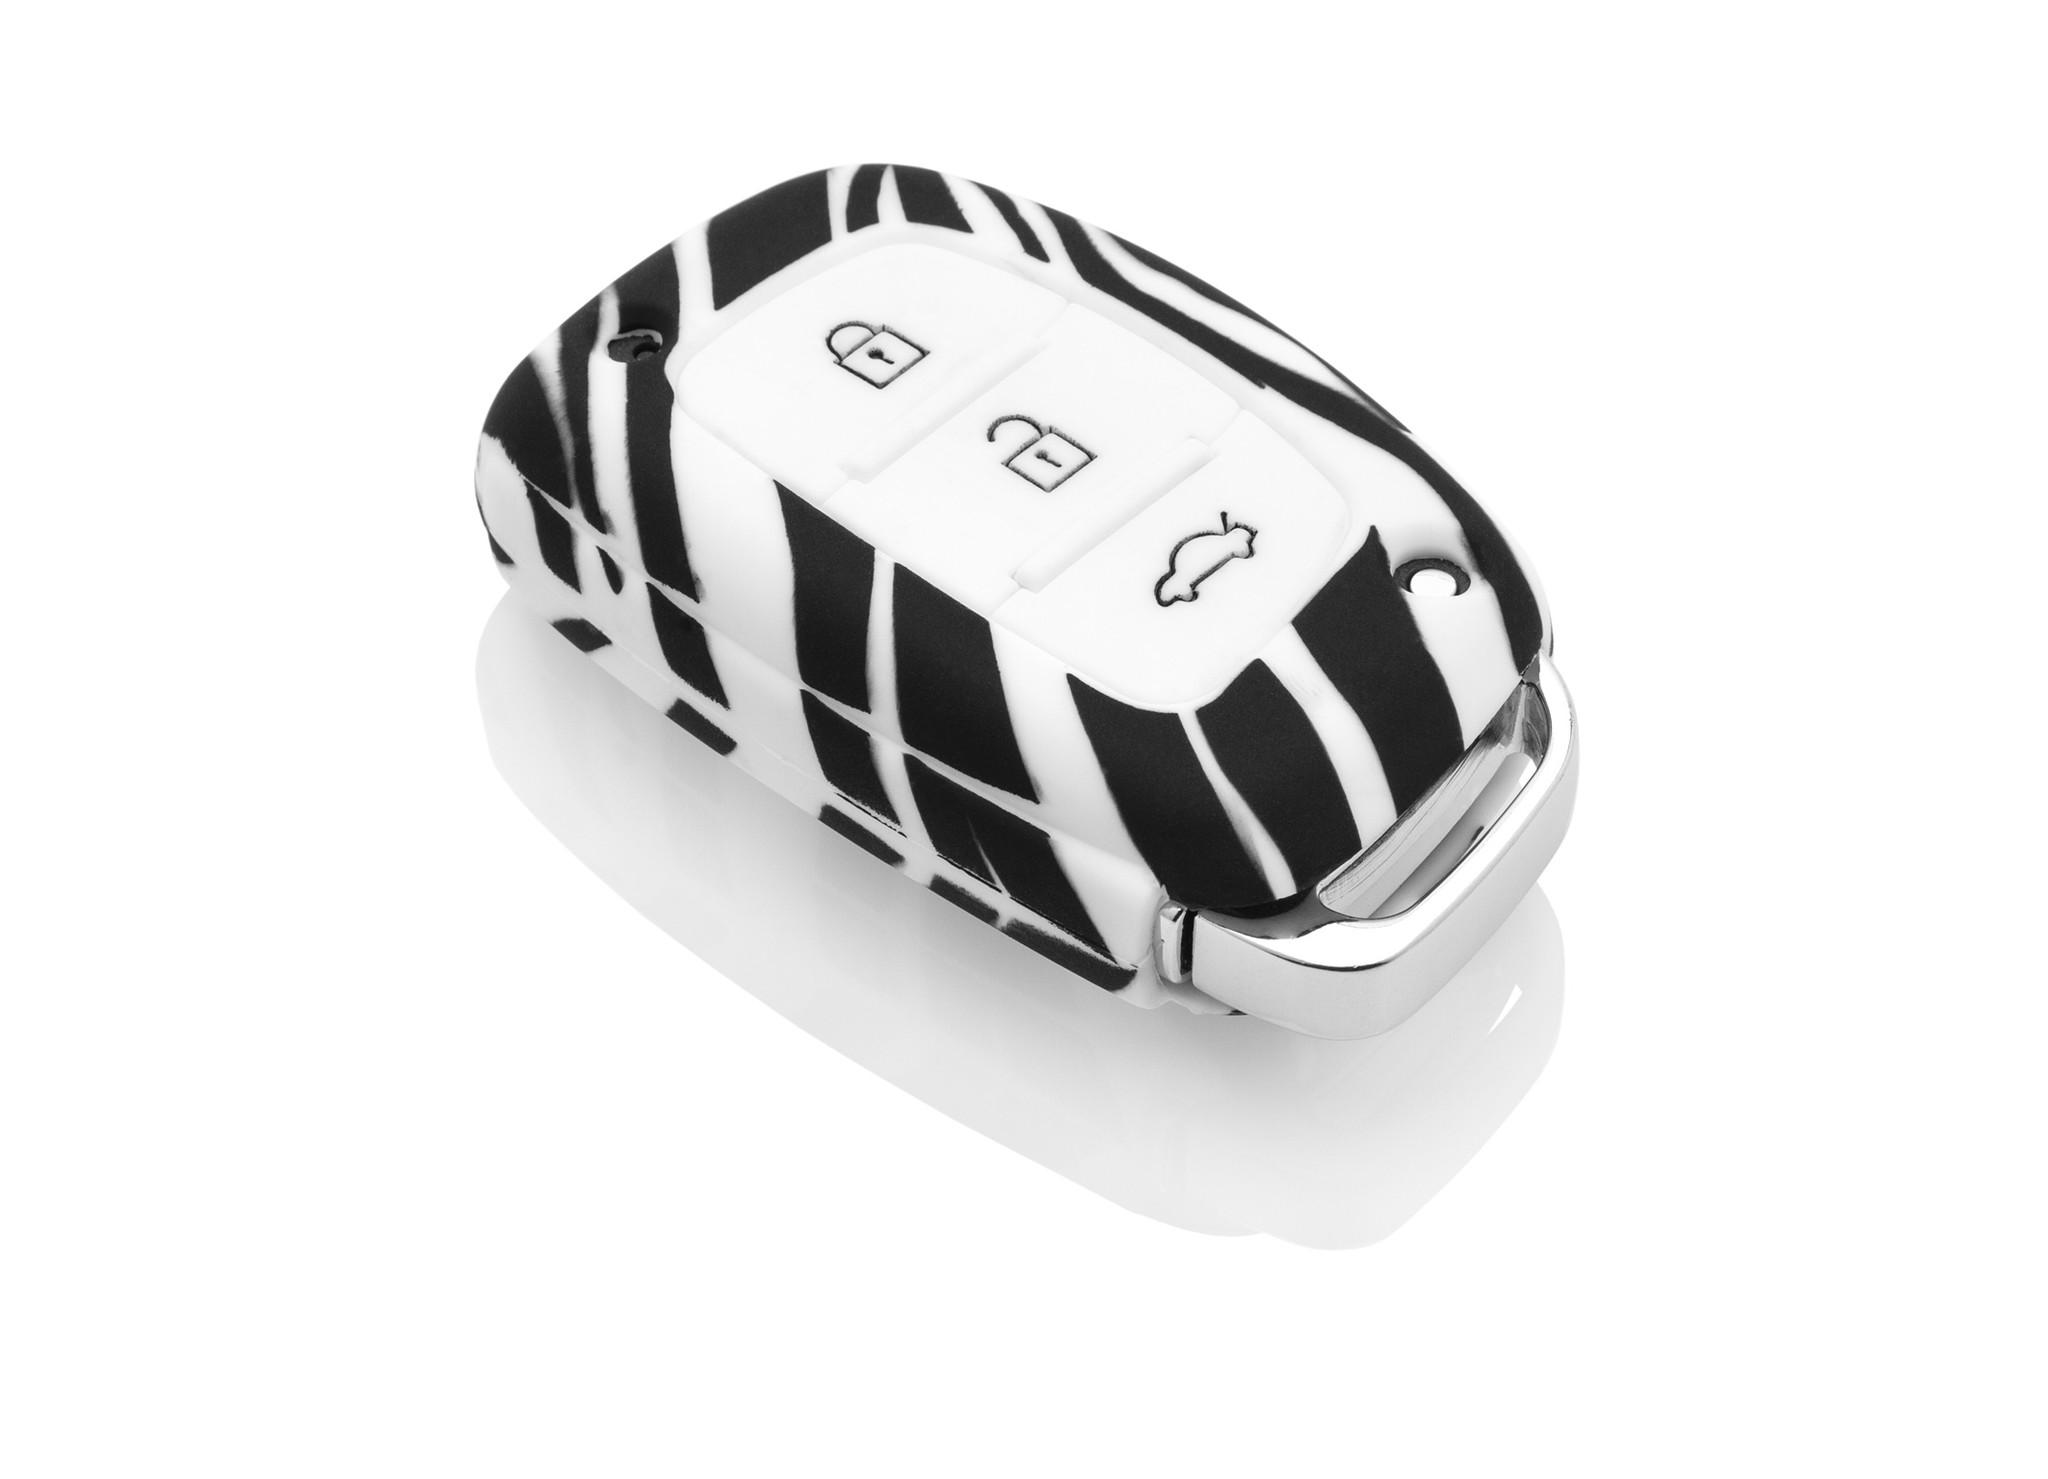 TBU car TBU car Sleutel cover compatibel met Hyundai - Silicone sleutelhoesje - beschermhoesje autosleutel - Zebra